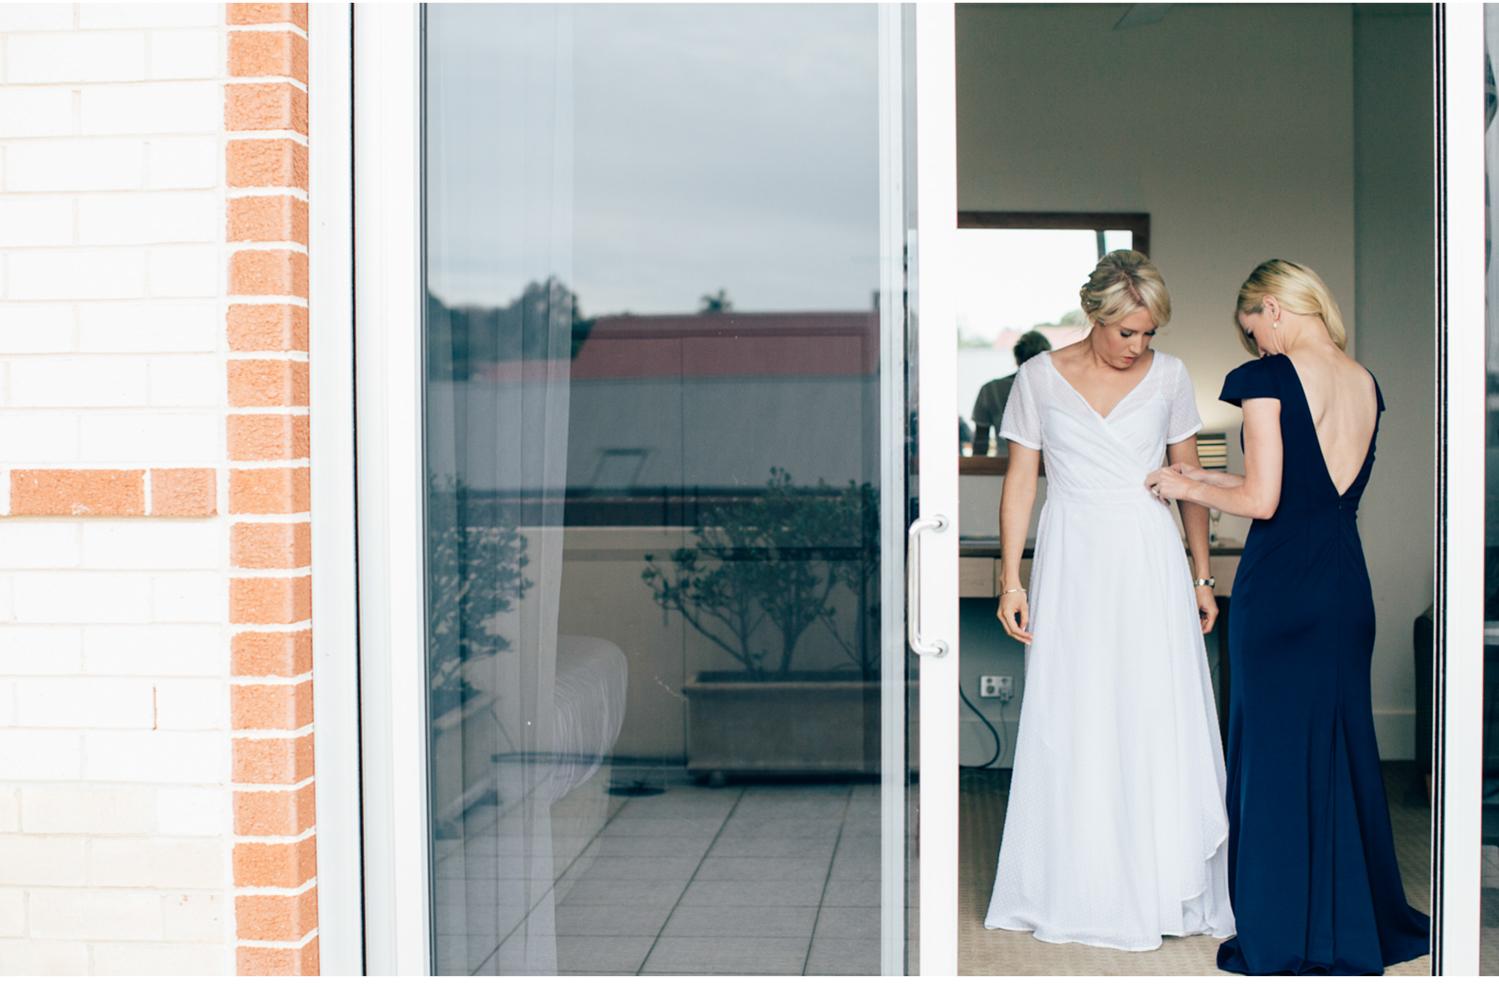 sheridan_nilsson_watsons_bay_wedding.16.jpg